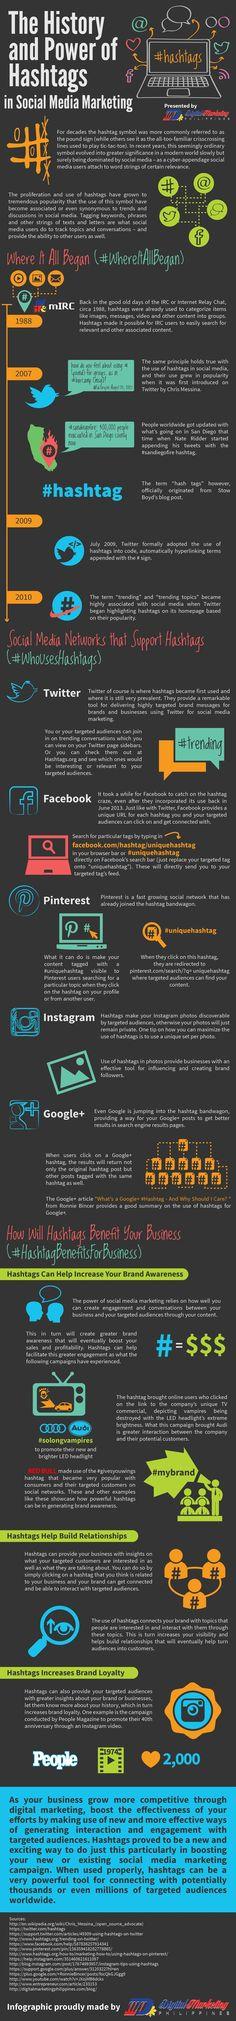 History Hashtag Social Marketing by Digital Marketing Philippines |webpixelkonsum — Konzepte für Online-Strategien